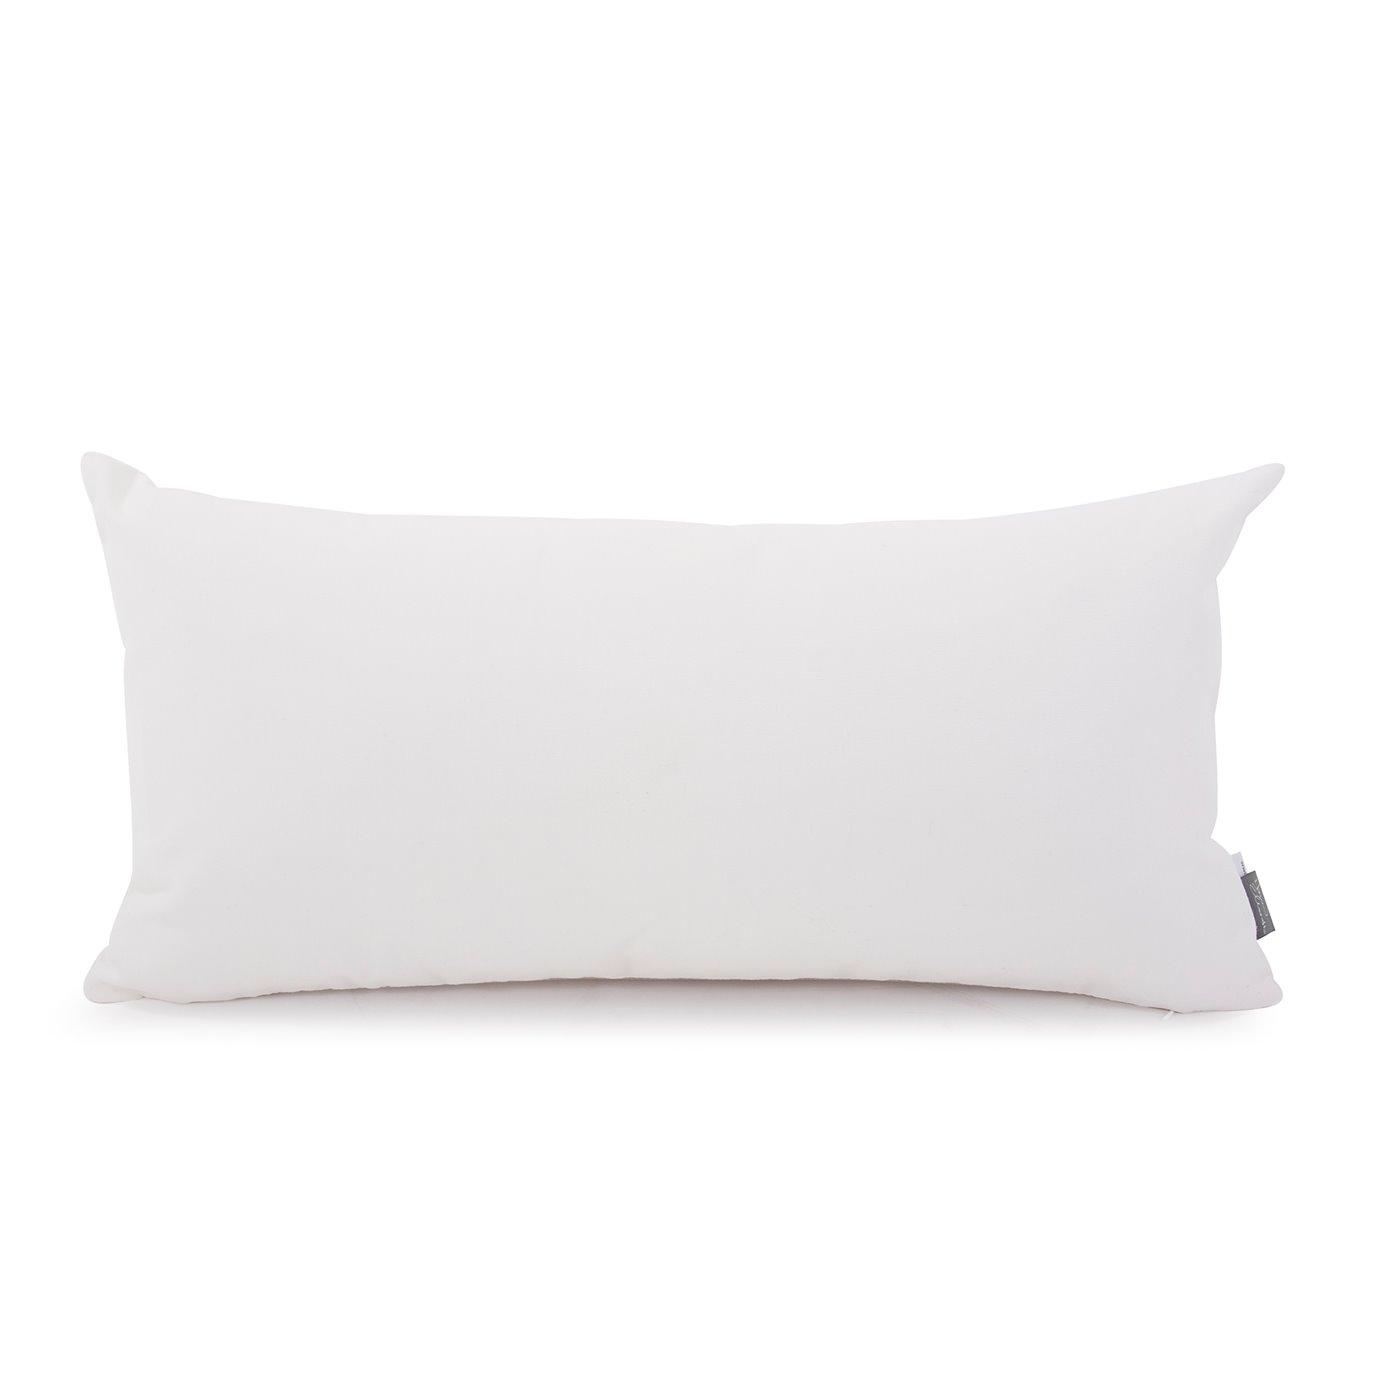 Howard Elliott Kidney Pillow Outdoor Sunbrella Seascape Natural